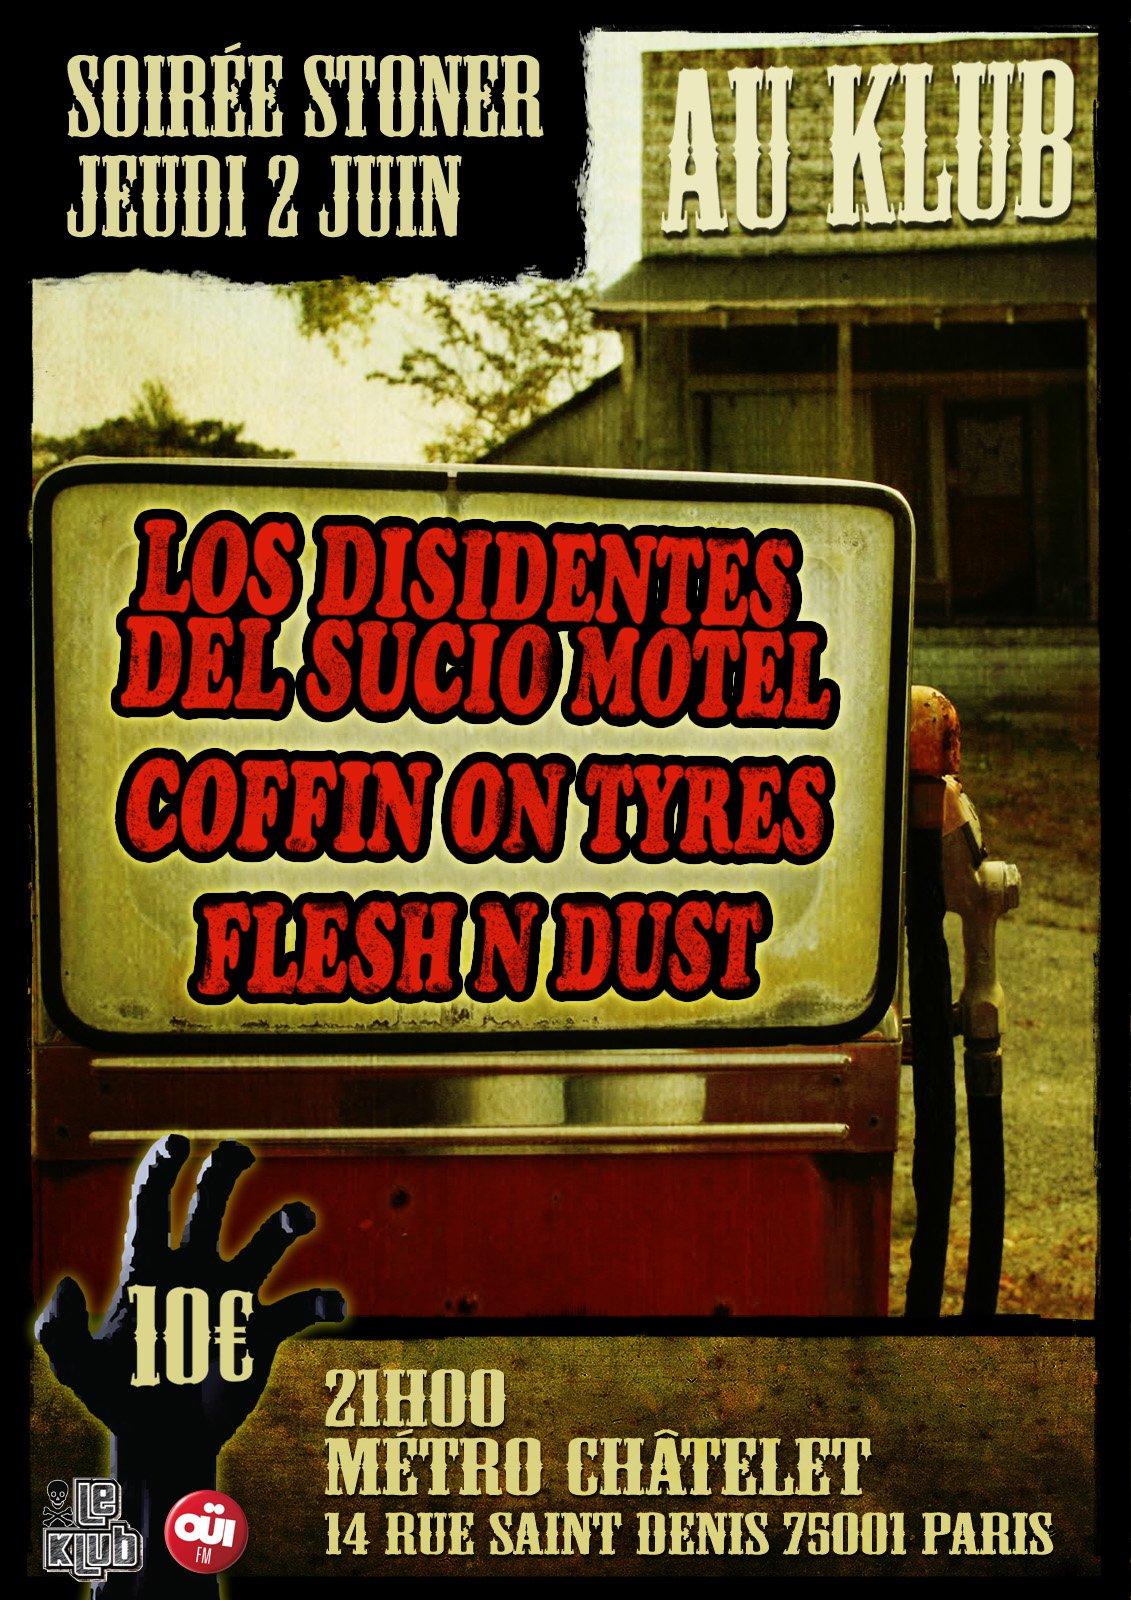 Coffin On Tyres + Los Disidentes Del Sucio Motel + Flesh & Dust @ Klub (Paris), le 02 Juin 2011